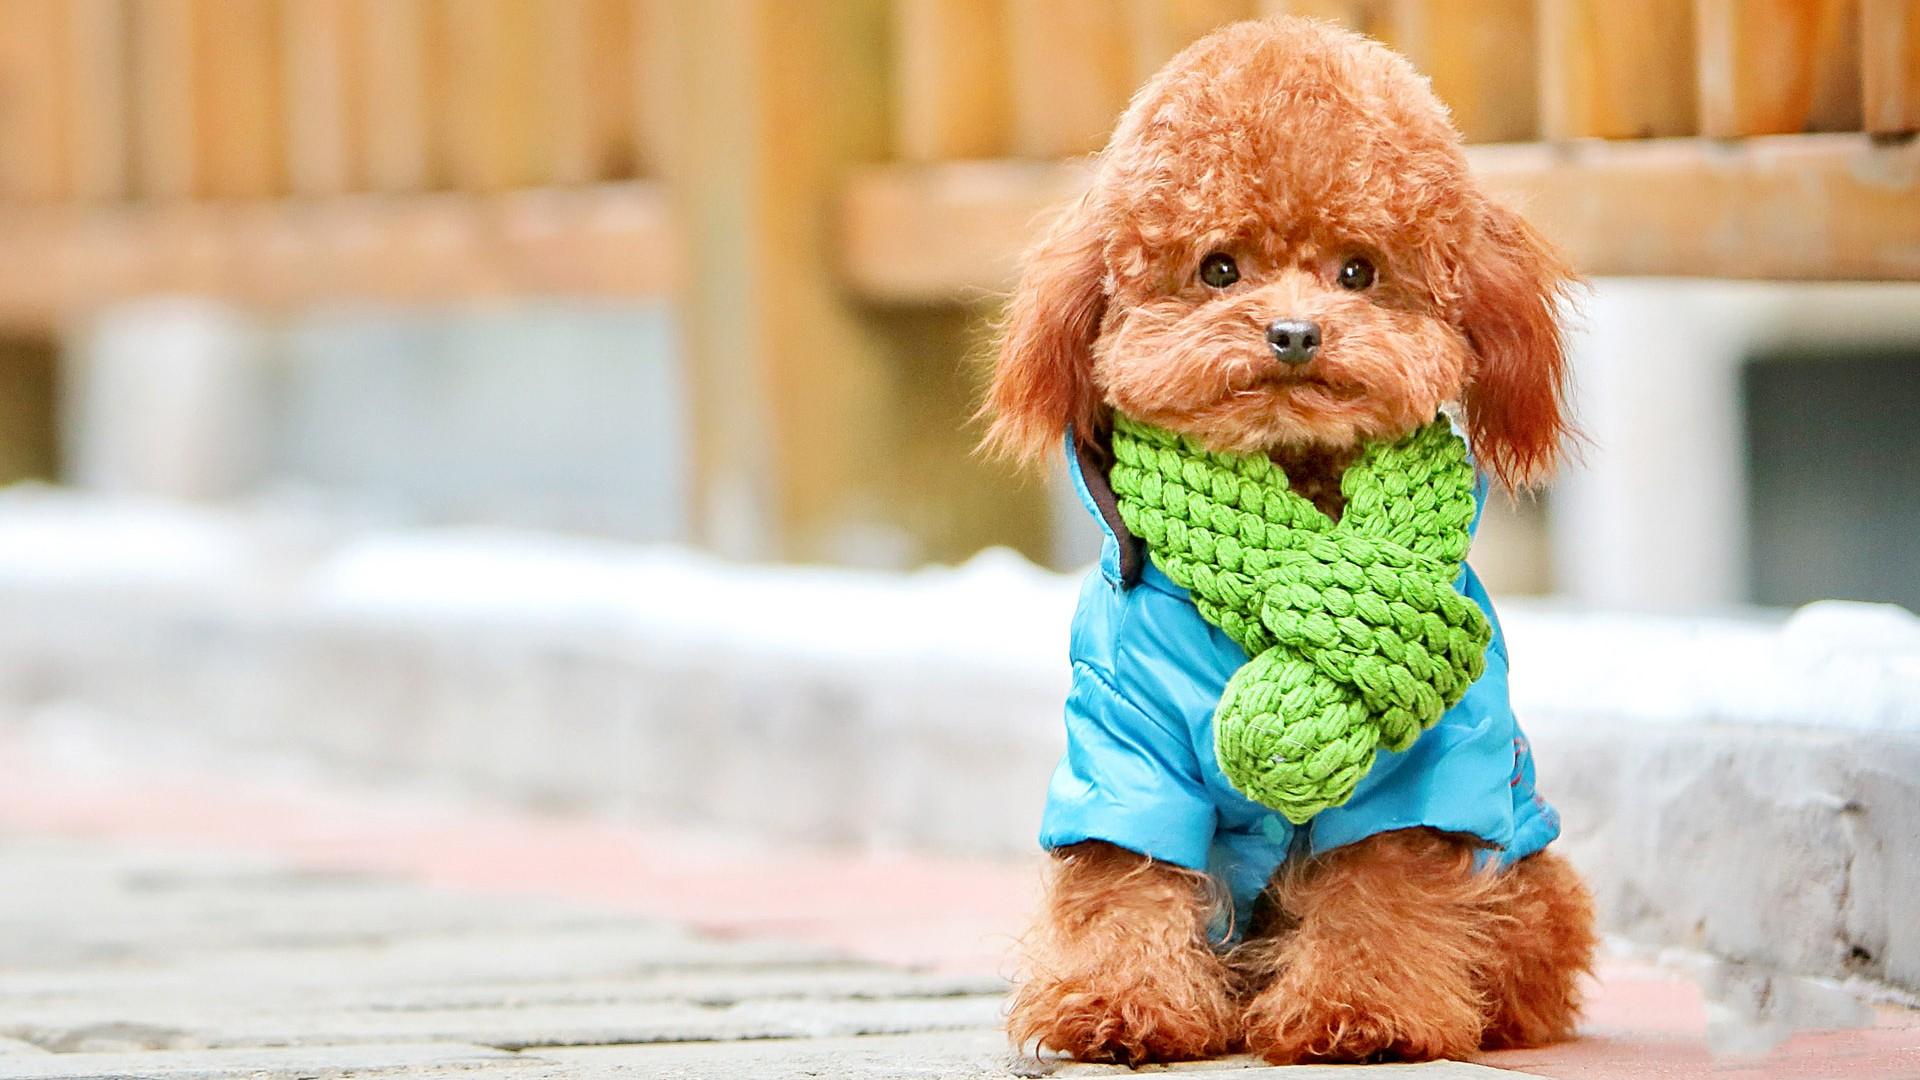 Cute Puppies Wallpaper 1080p 14 Hd Poodle Dog Wallpapers Hdwallsource Com